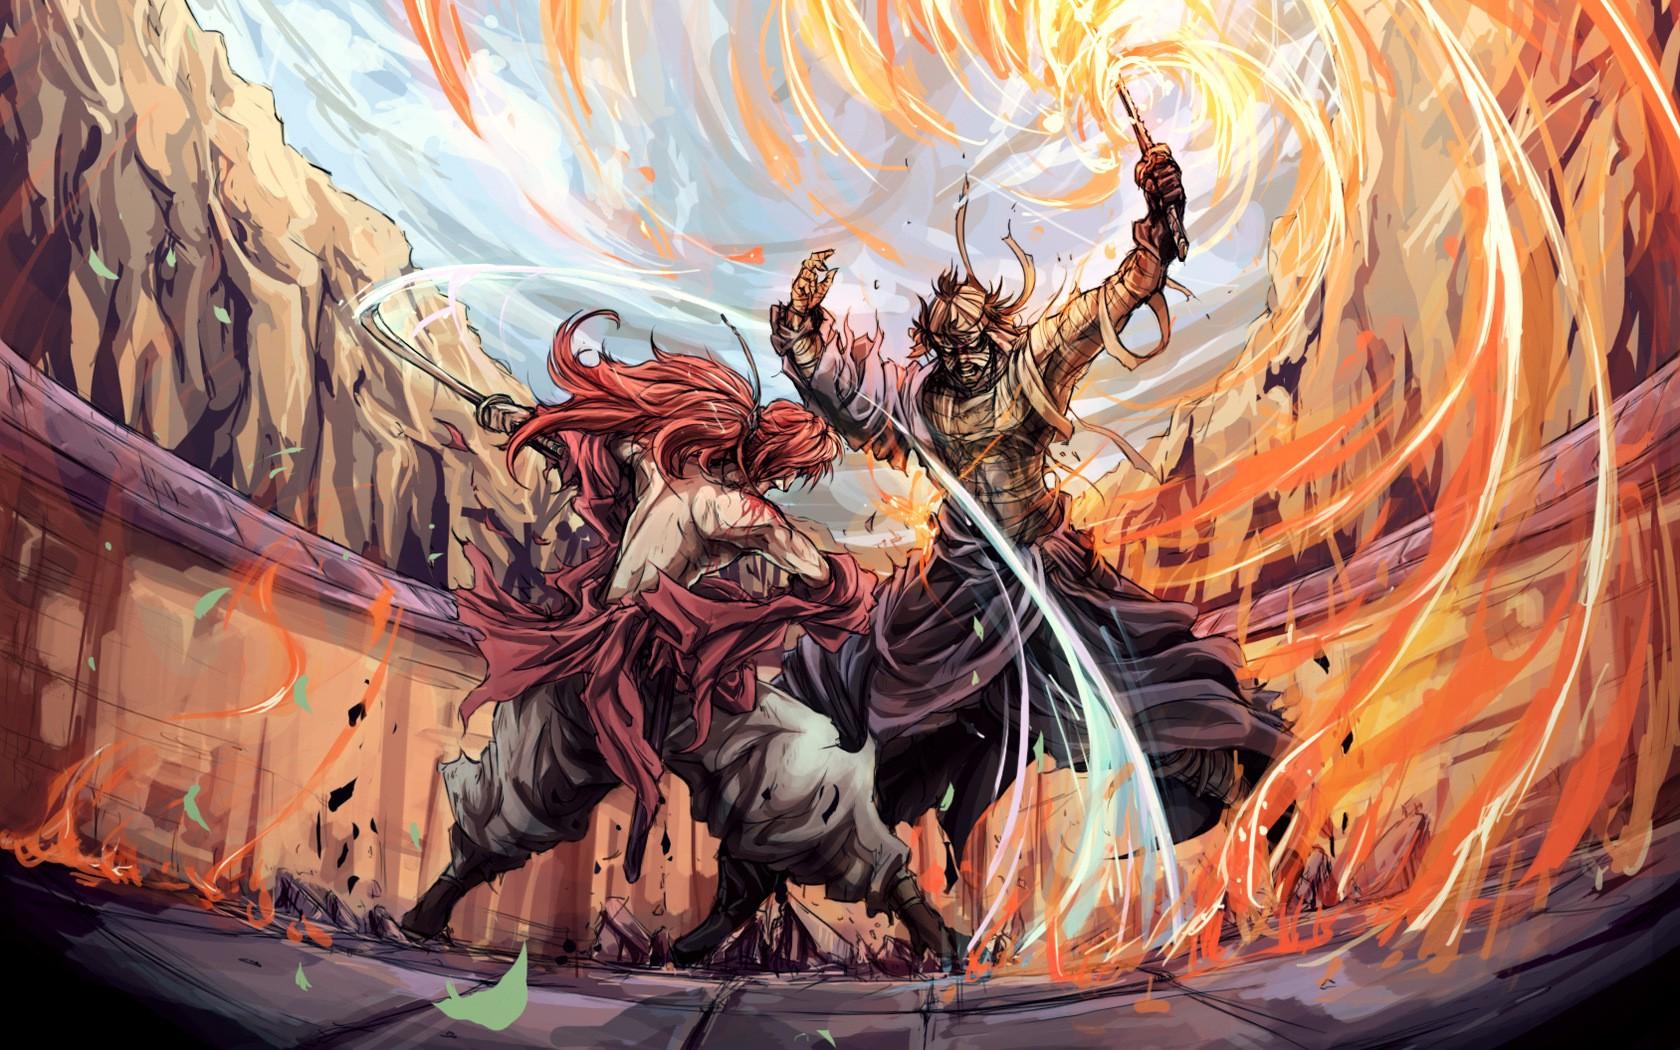 1680x1050 Px Anime Manga Rounin Rurouni Kenshin Samurai